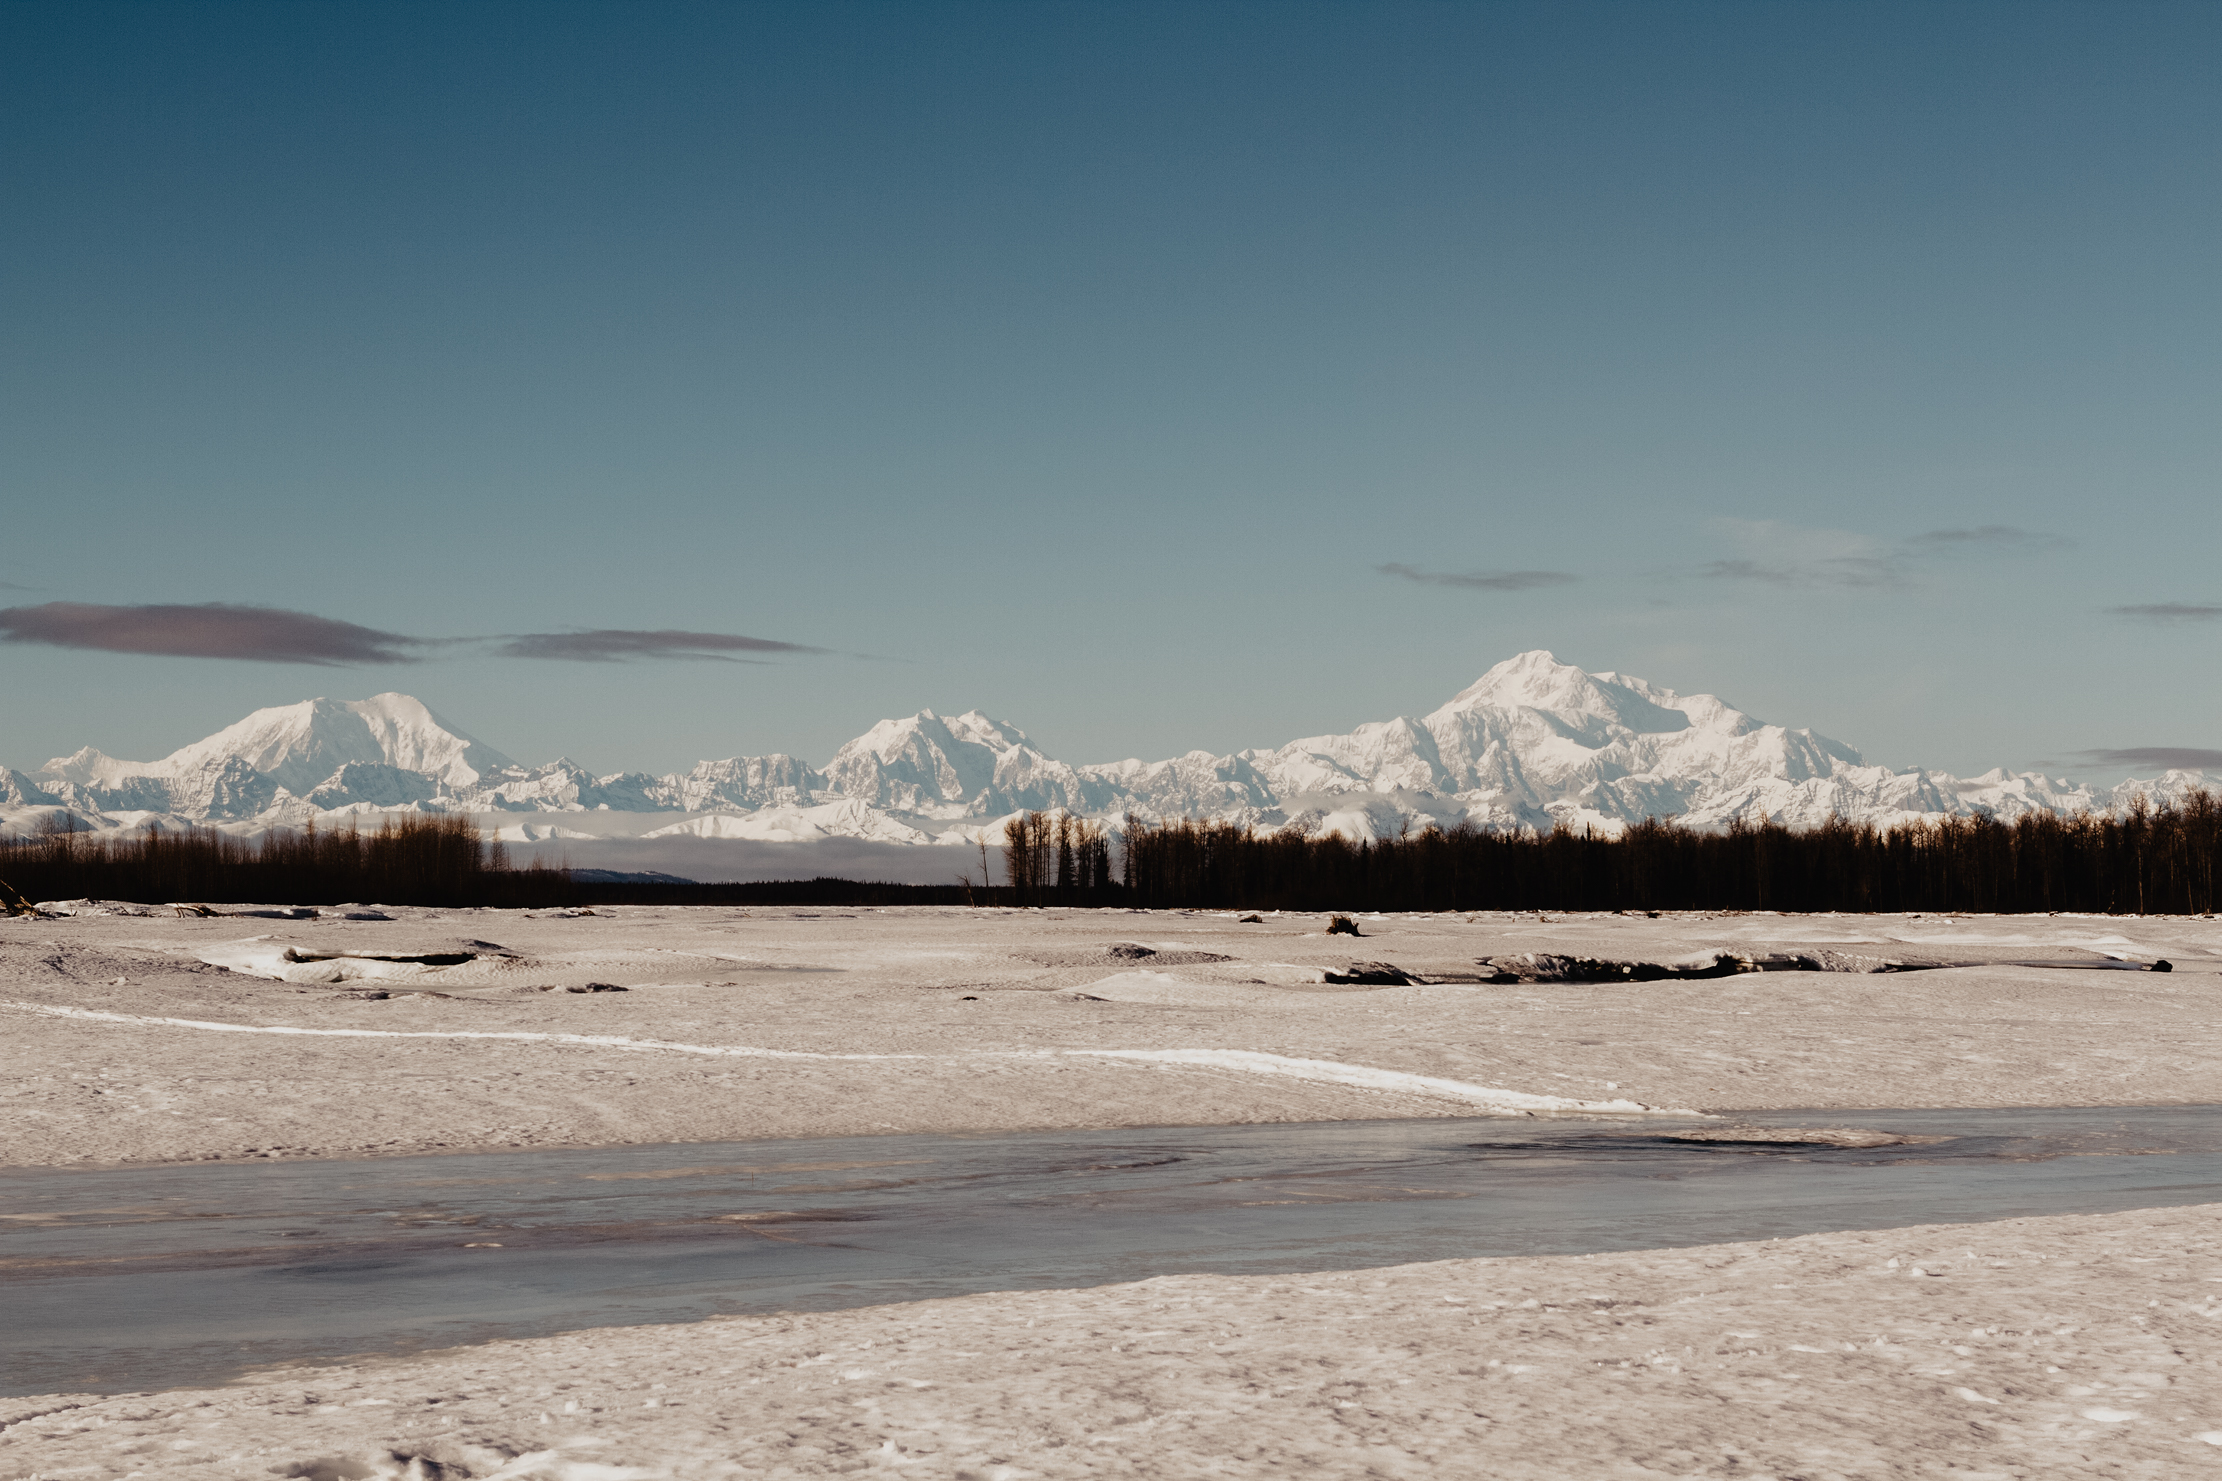 Denali Mount McKinley | Alaska Adventure Photographer